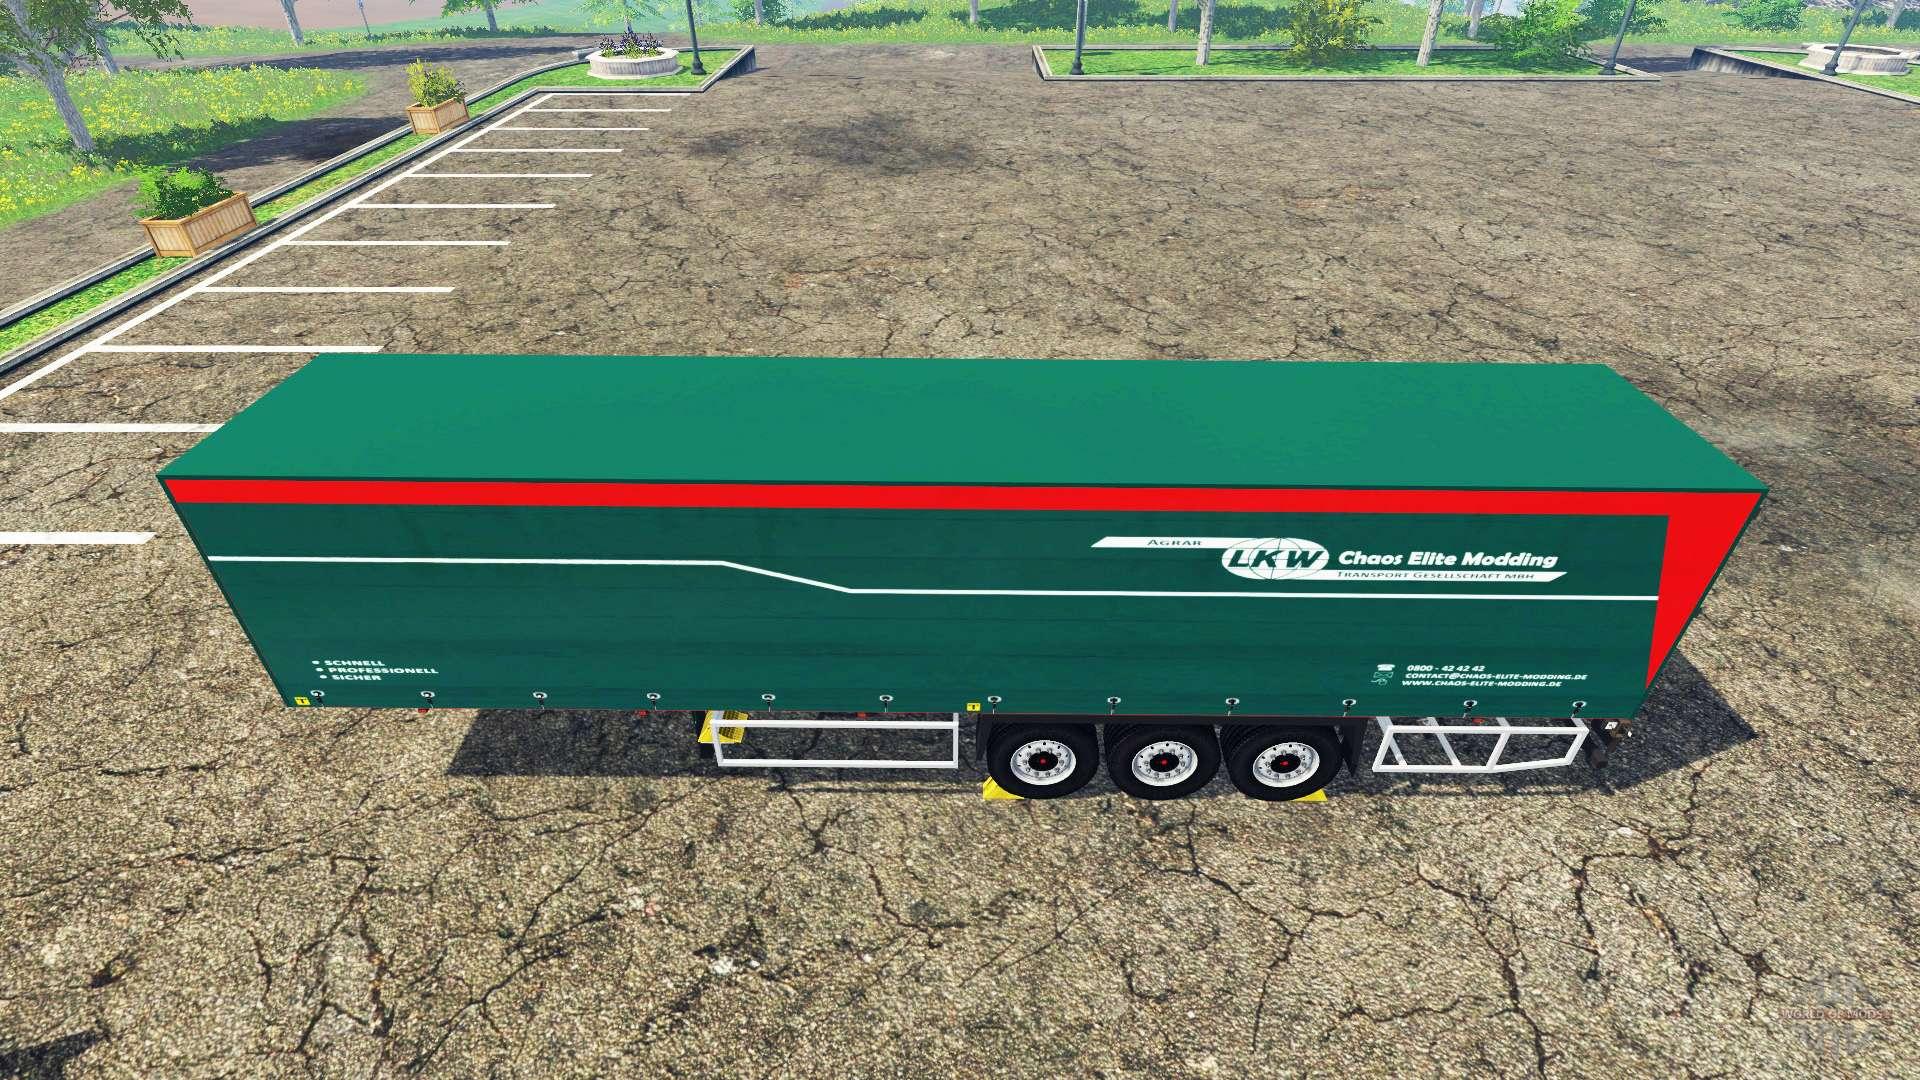 lkw transport simulator